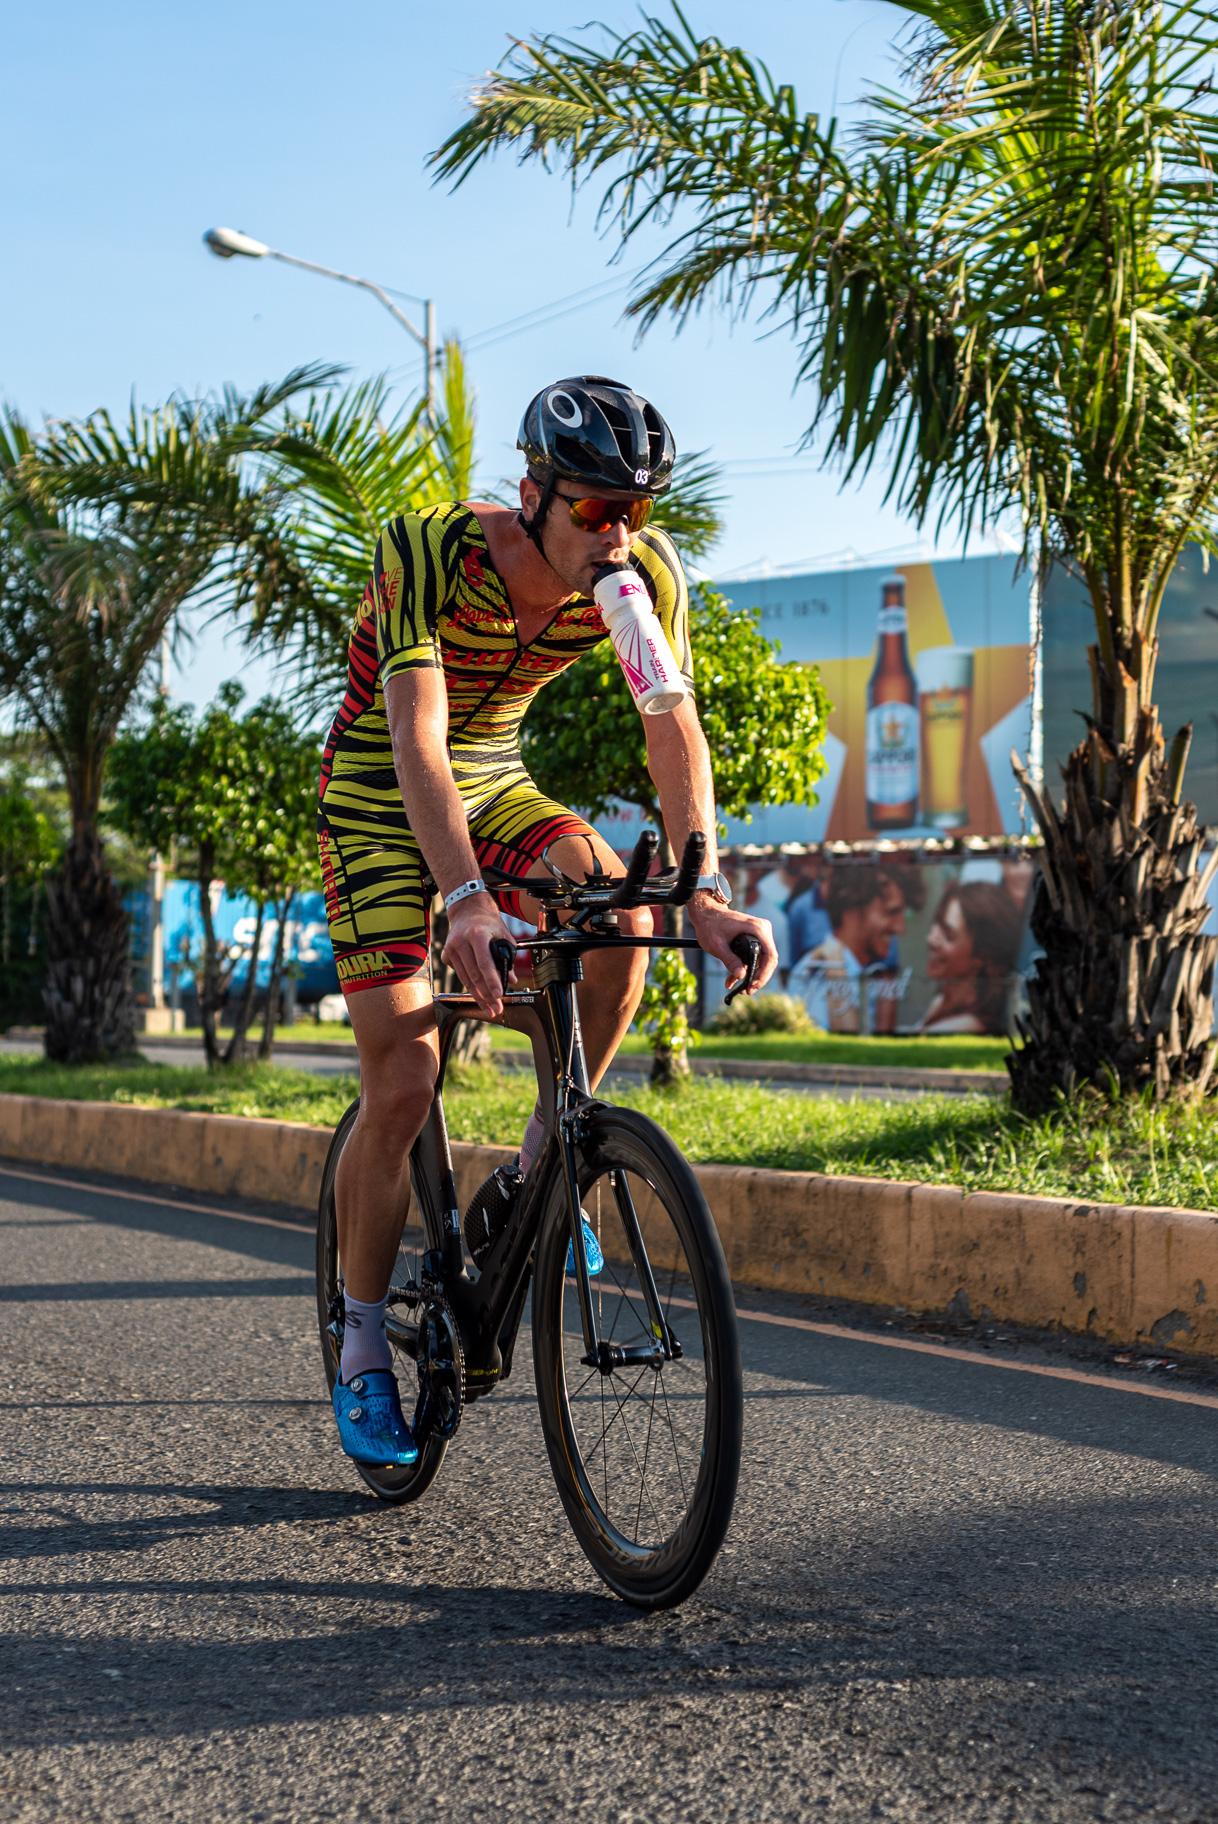 Gallery: 2019 Century Tuna Ironman 70.3 Subic Bay race day